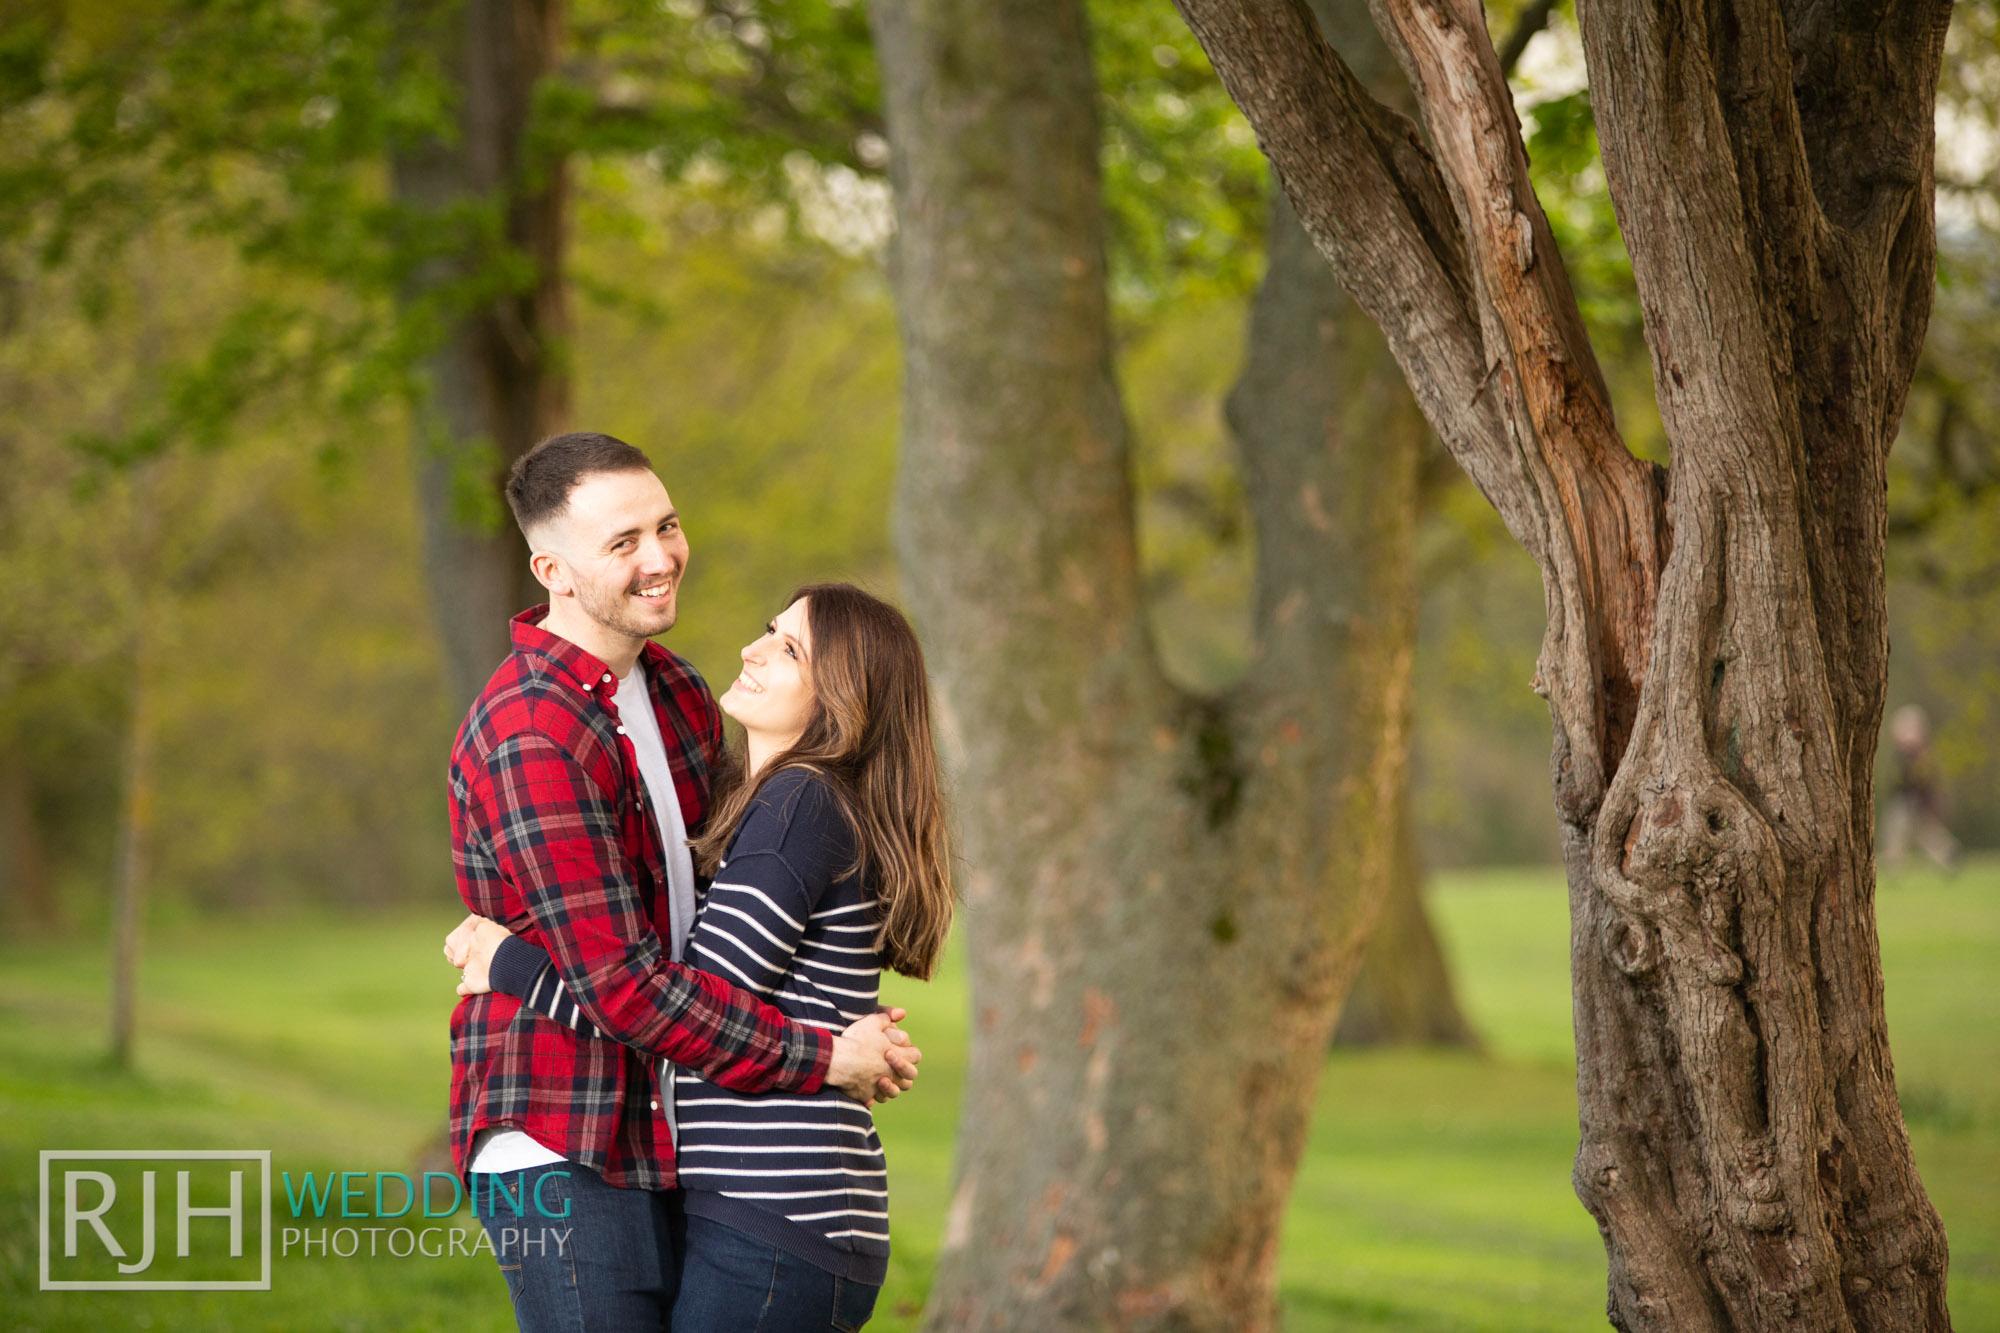 Pre-wedding photography_Abbie & Reece_Graves Park_009_IMG_1233.jpg